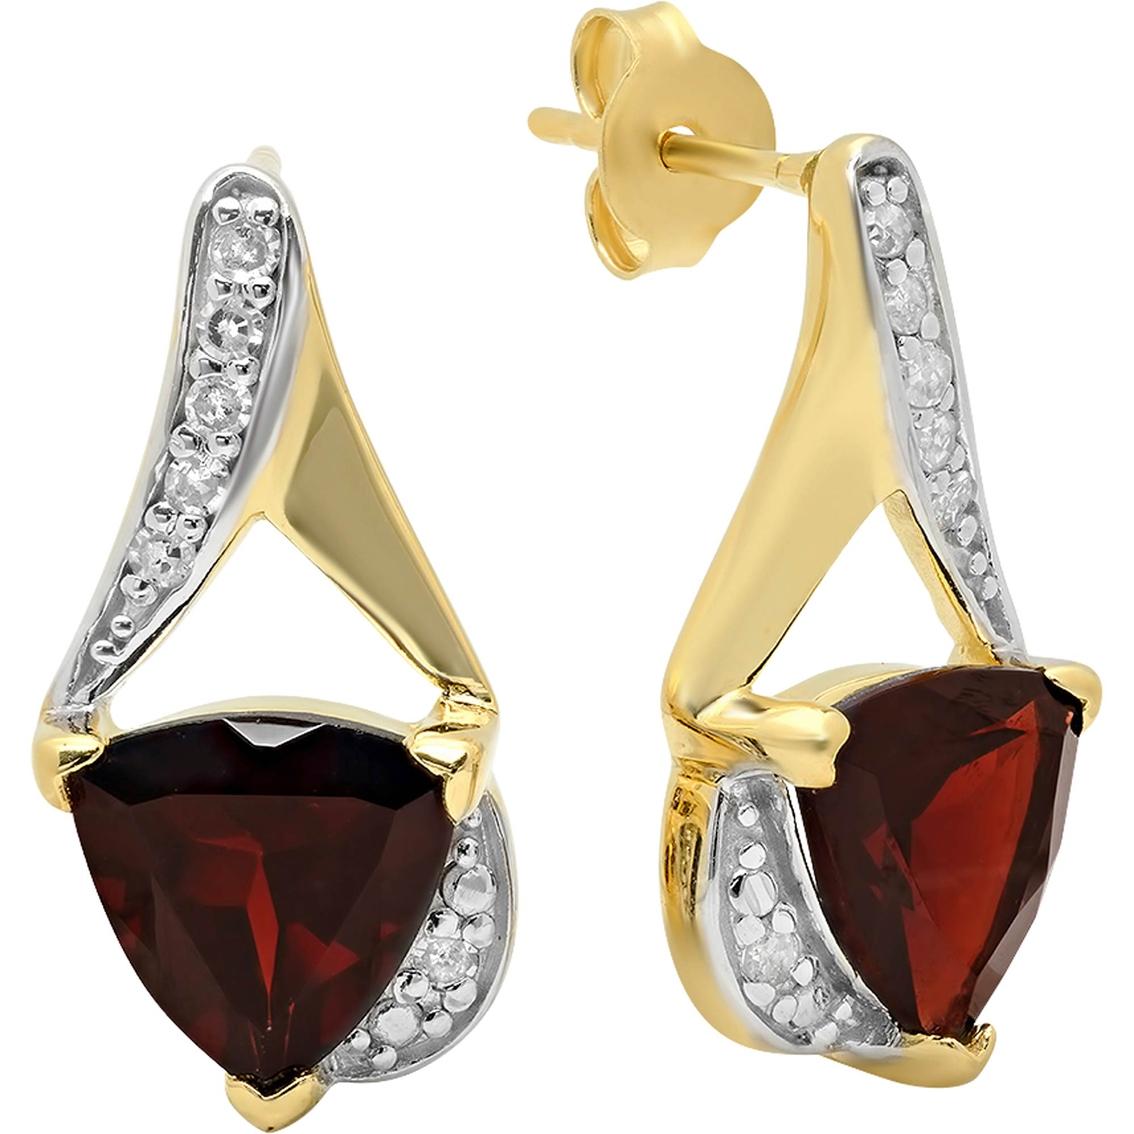 Trillion Cut Stud Earrings 14k Gold Over Sterling Silver